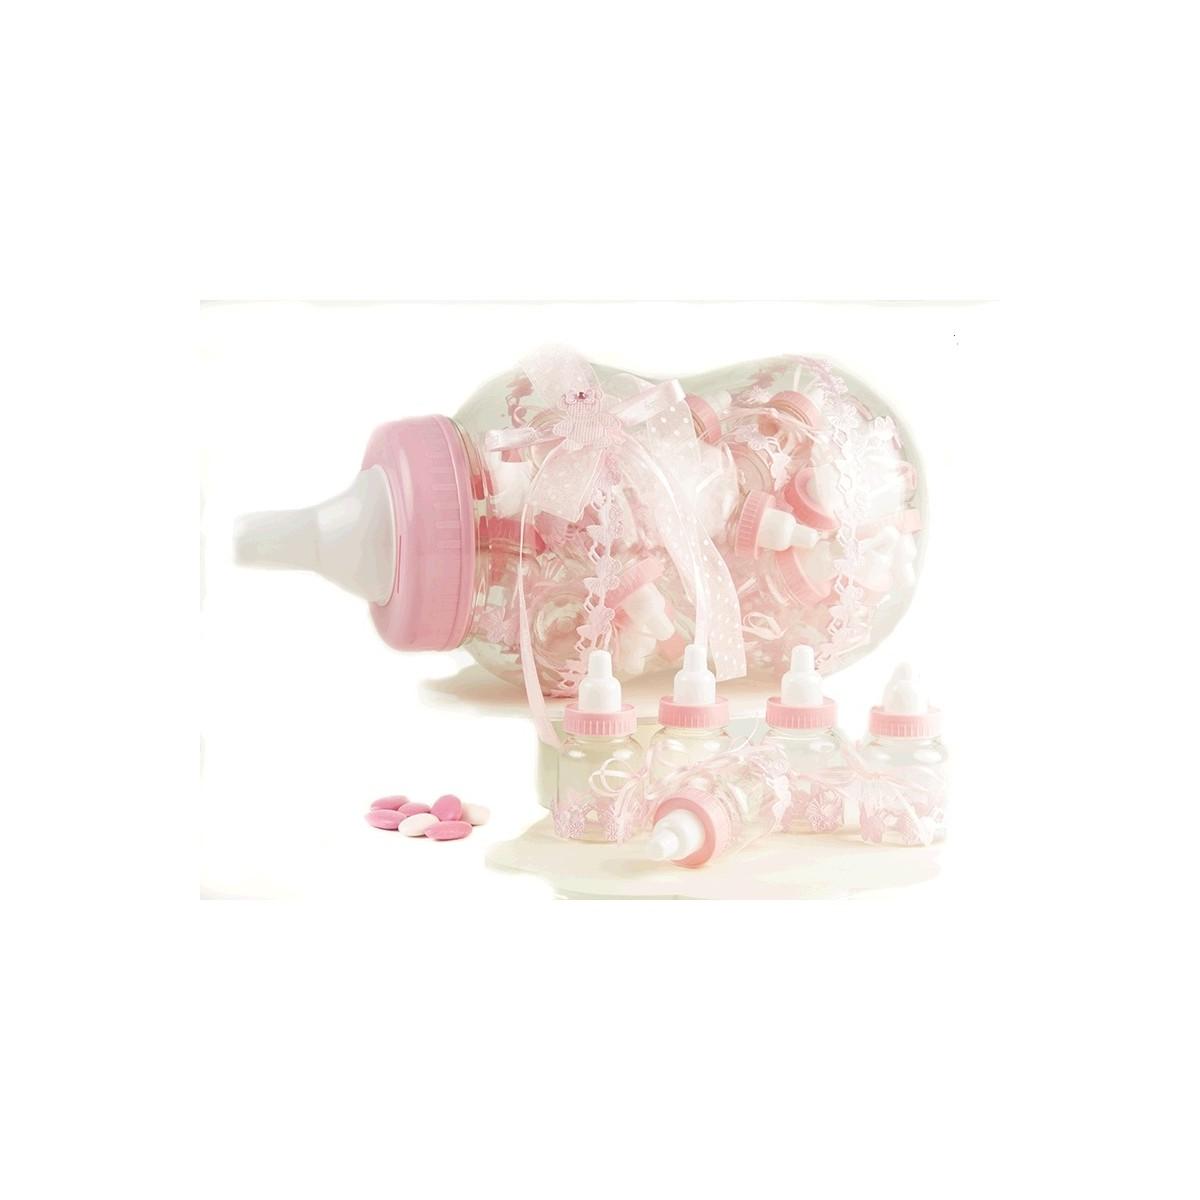 30 Contenants dragées biberon Rose + Présentoir